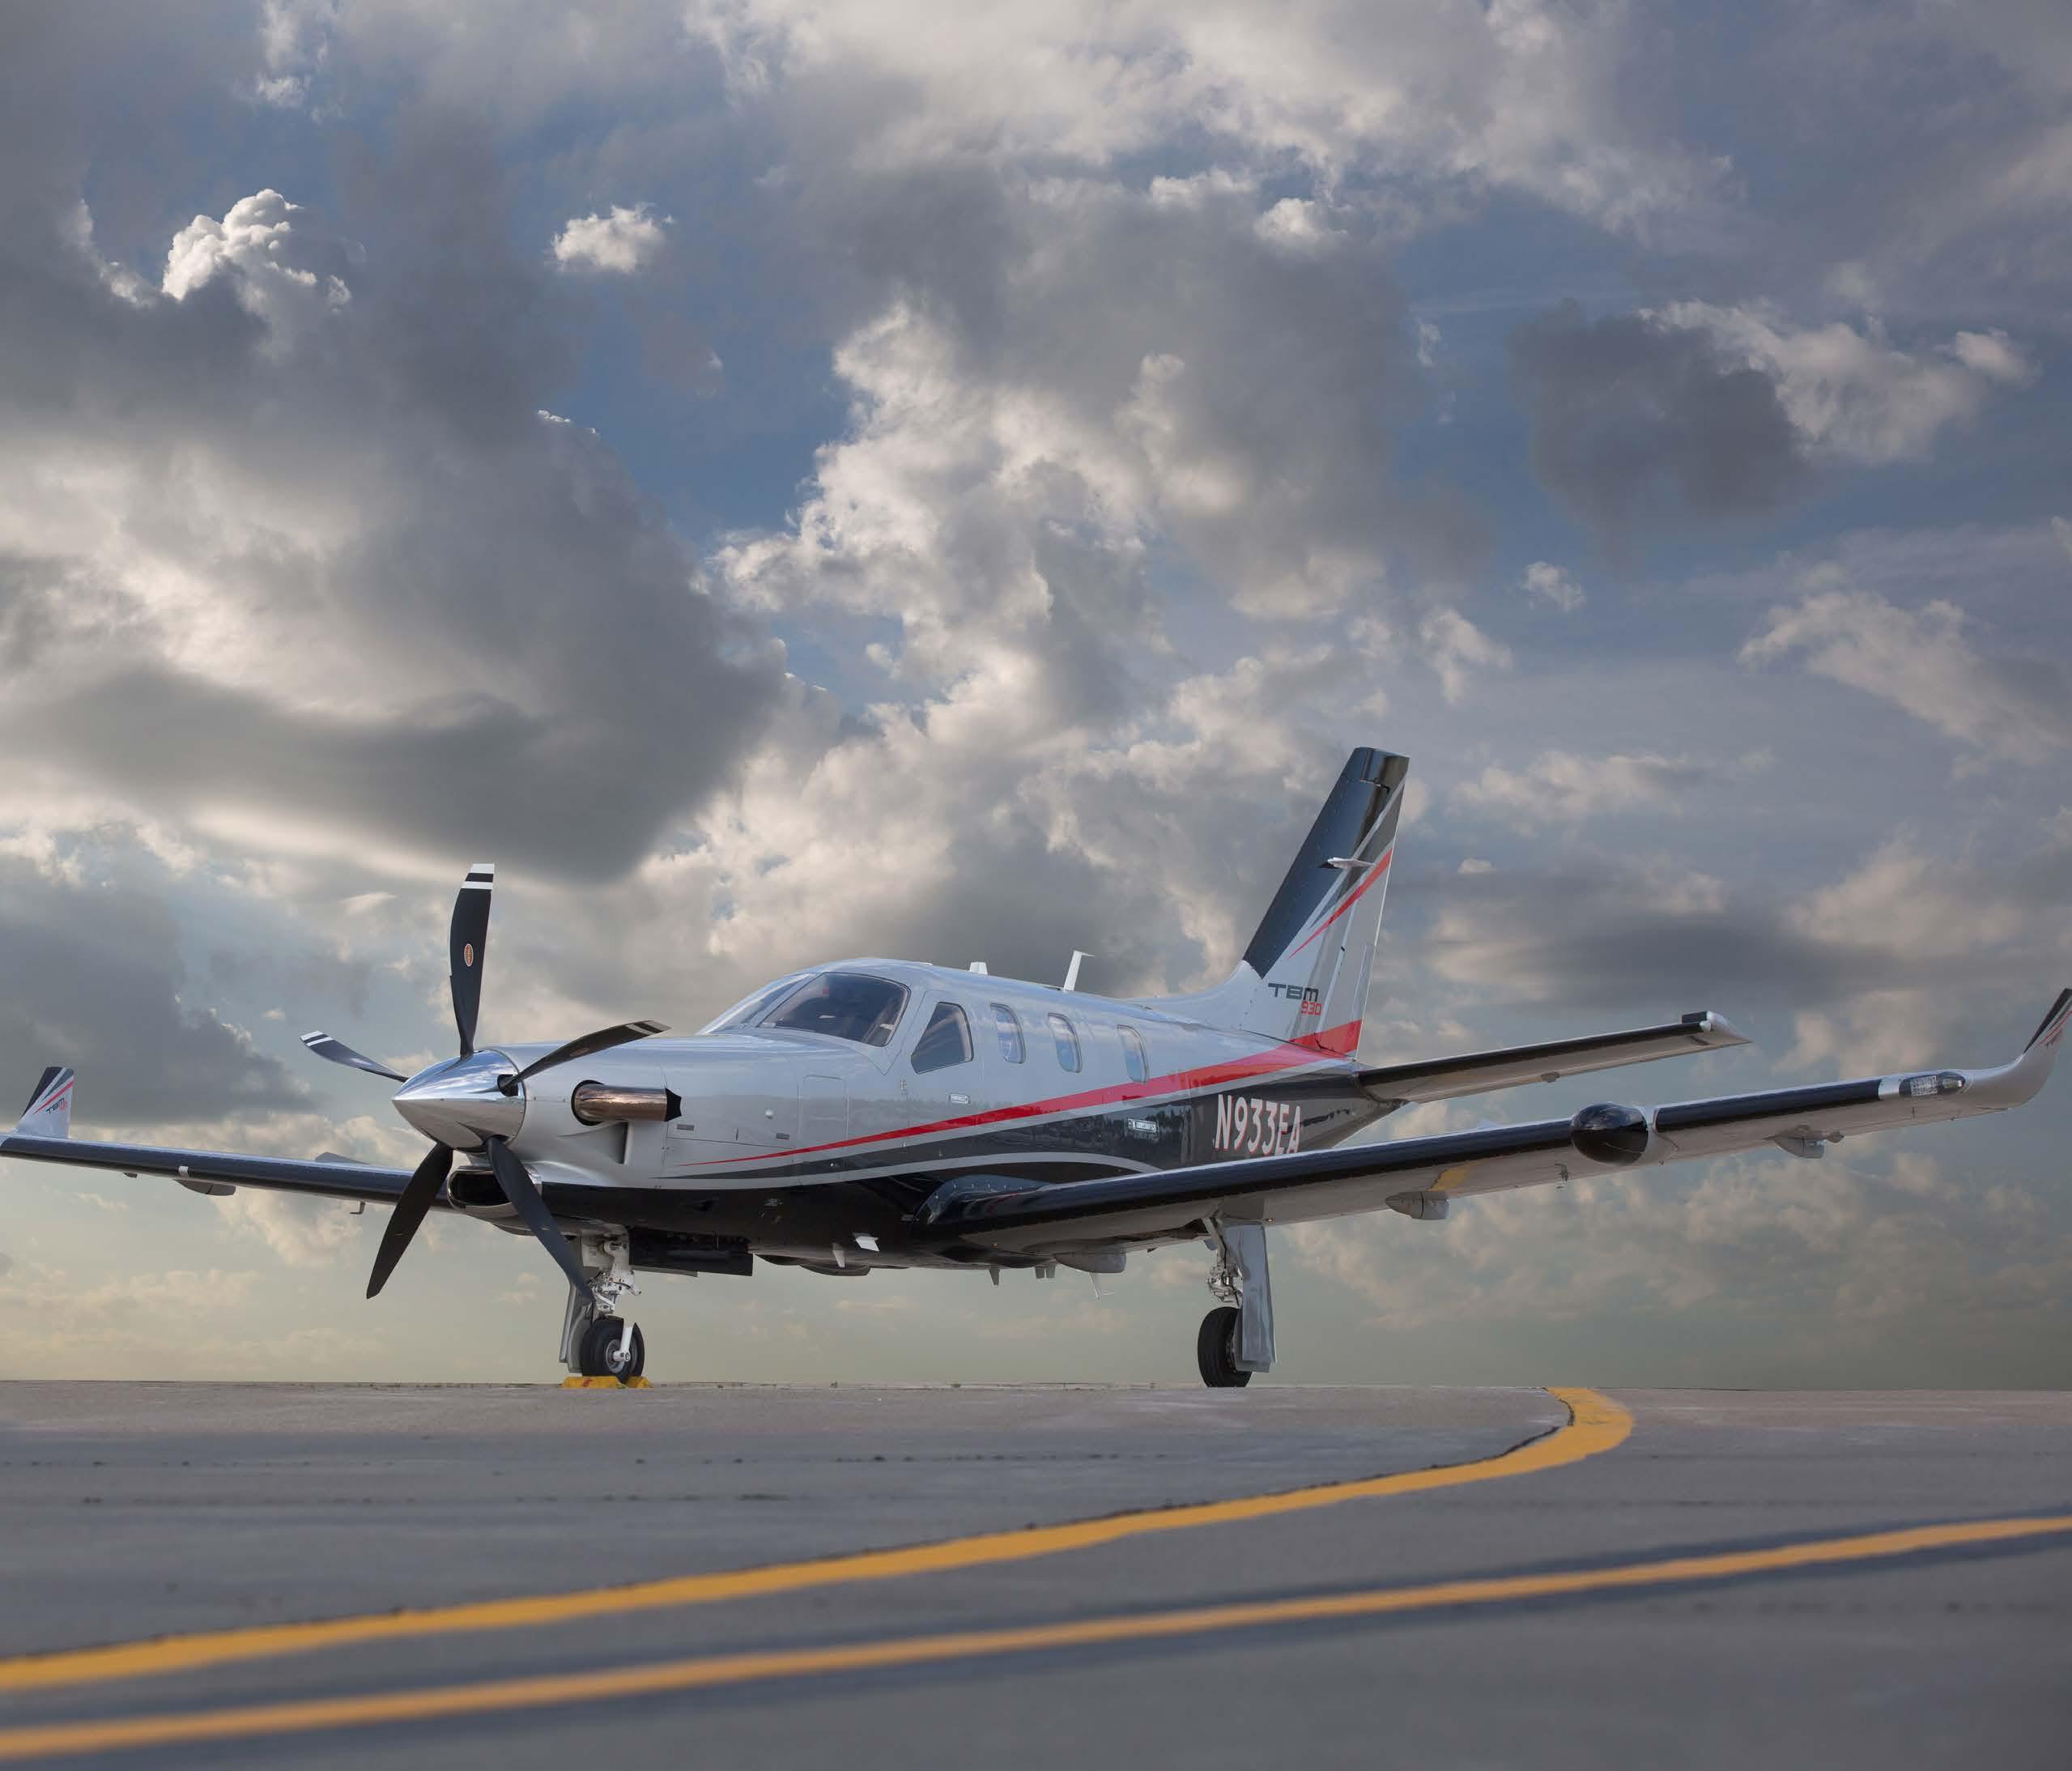 Aircraft Listing - Socata TBM 930 listed for sale